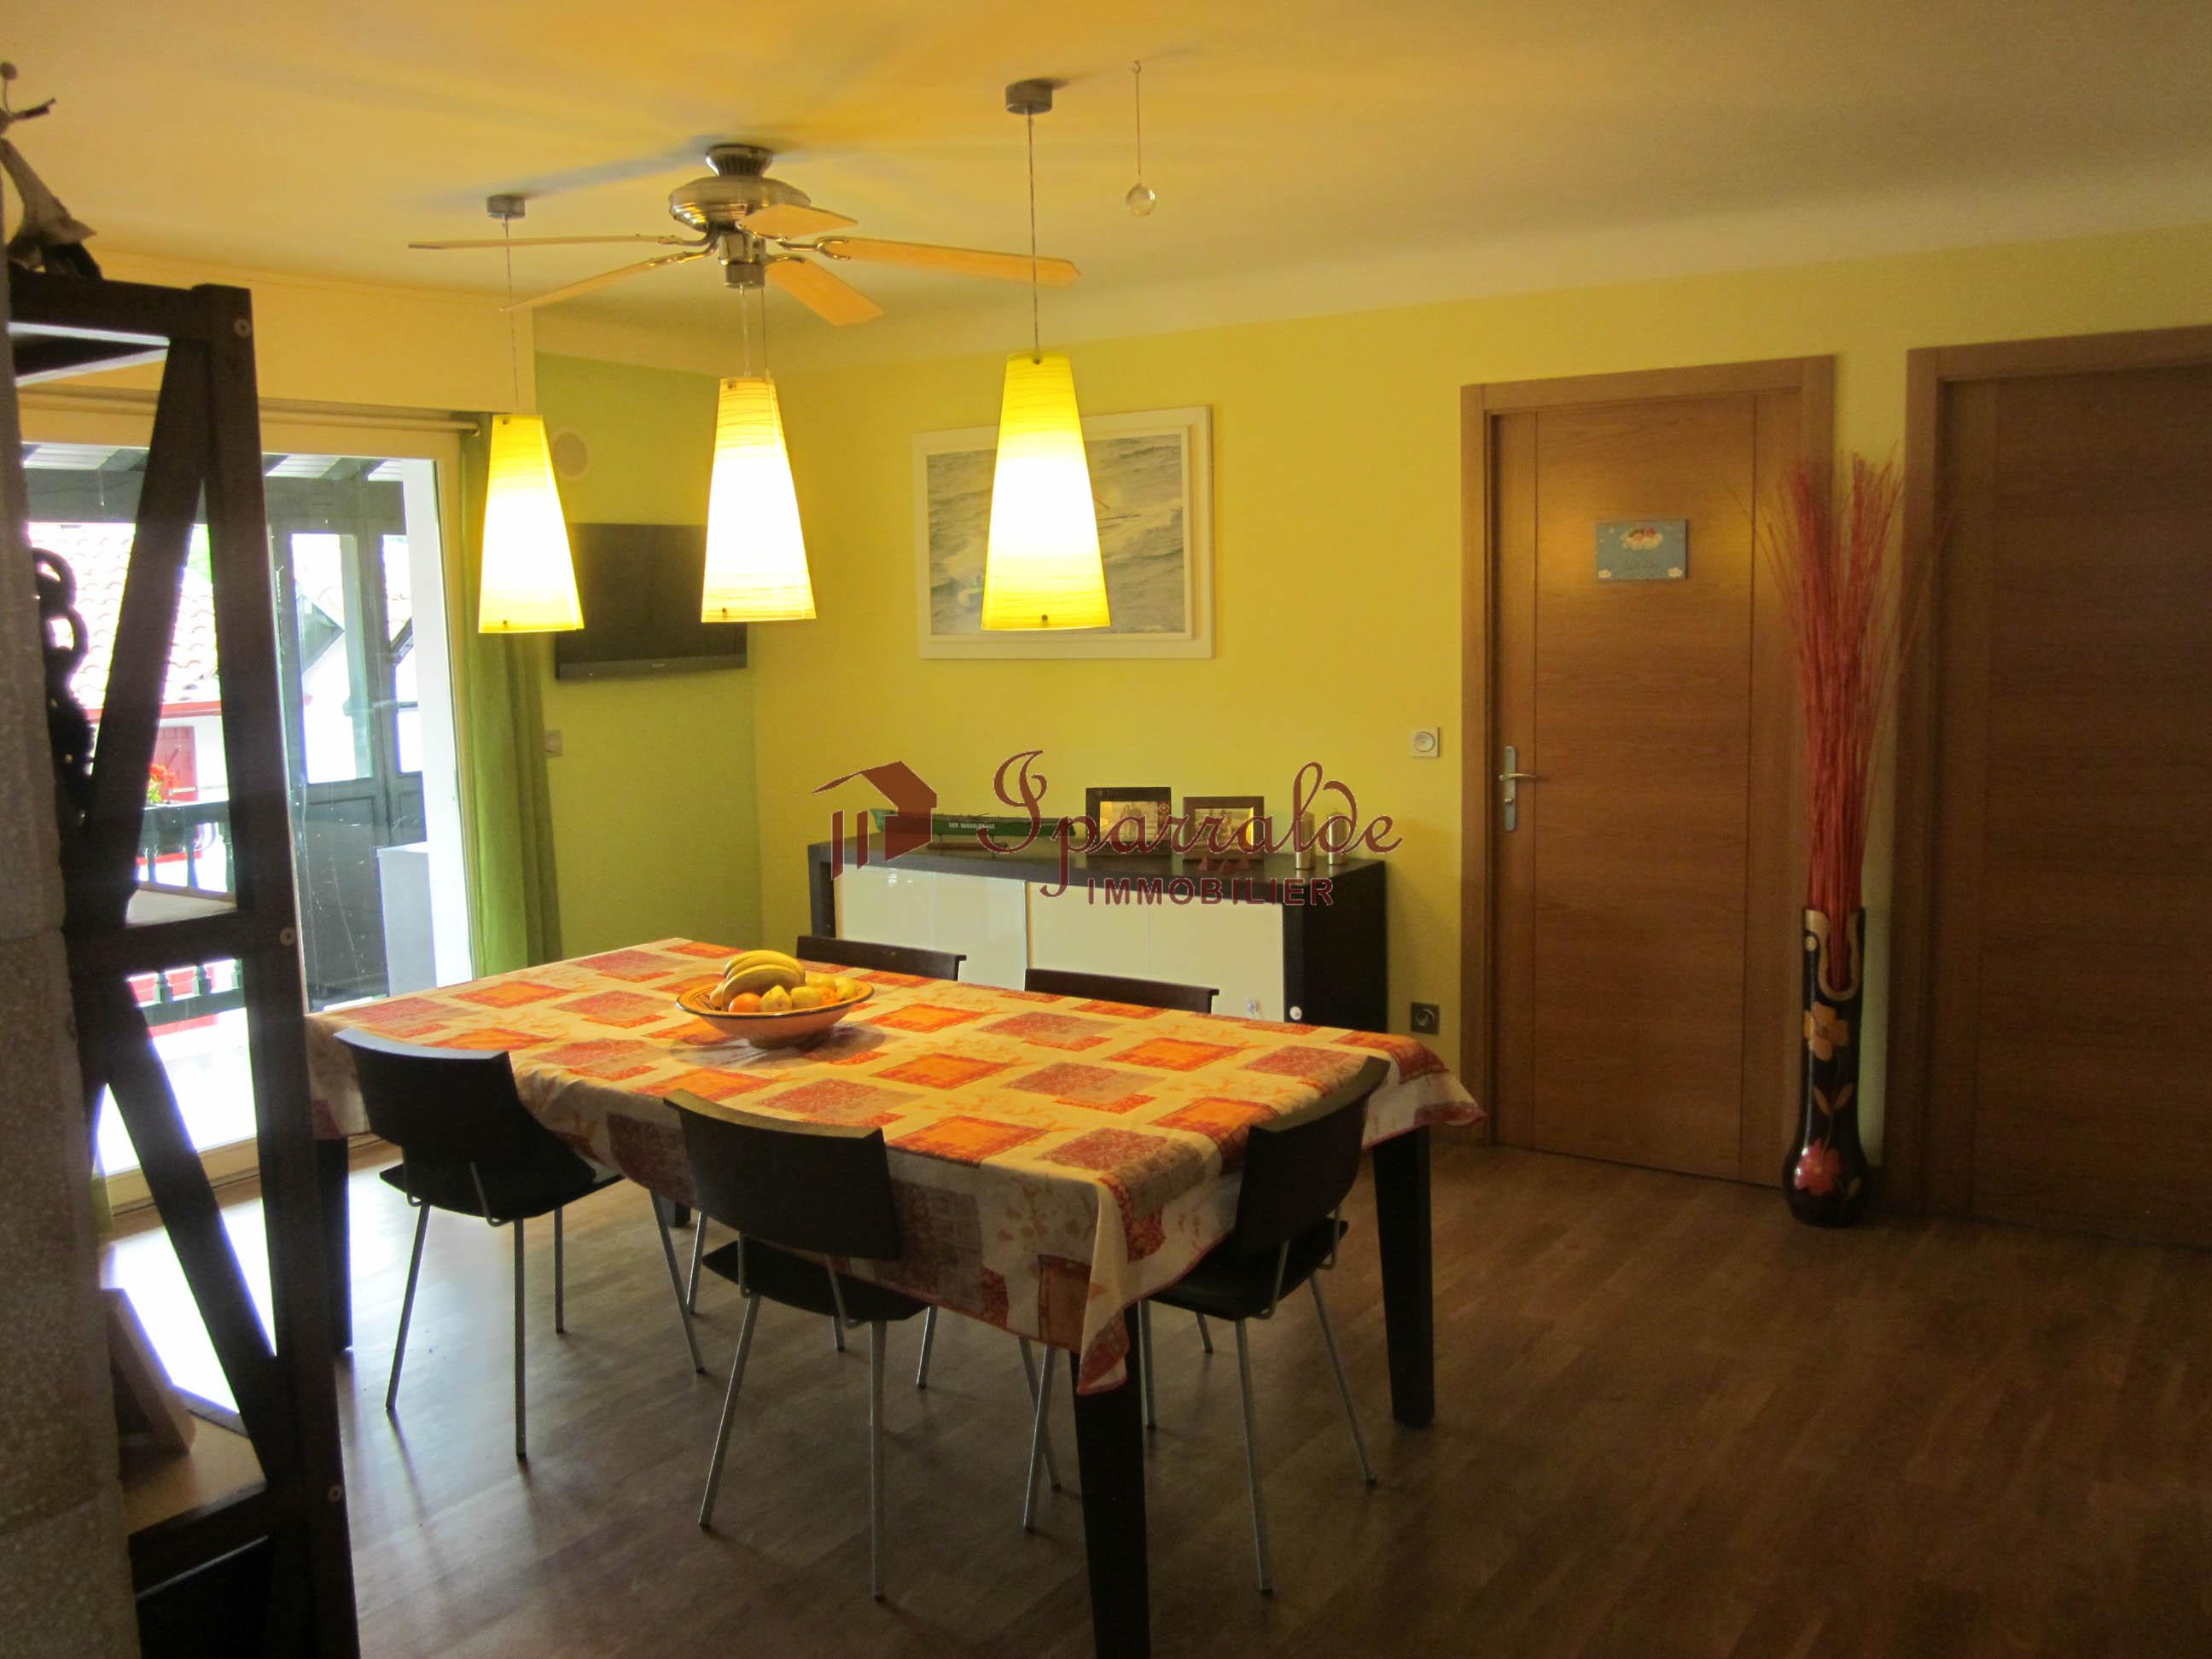 Se vende piso con terraza, chimenea, desván de 112 m2 y garaje priva...